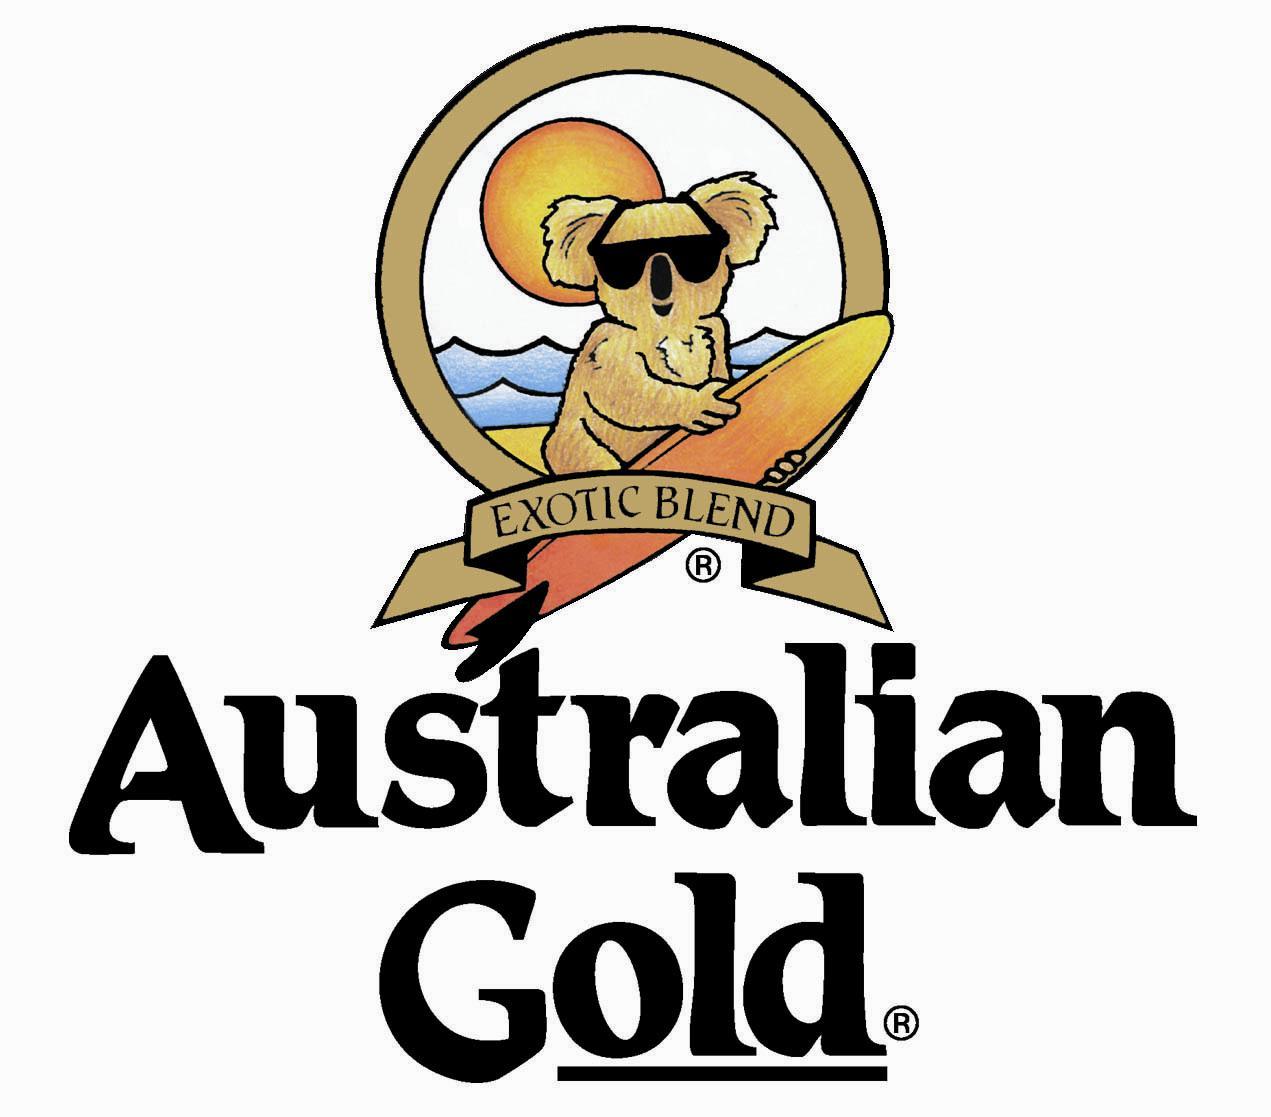 Australian-gold-logo